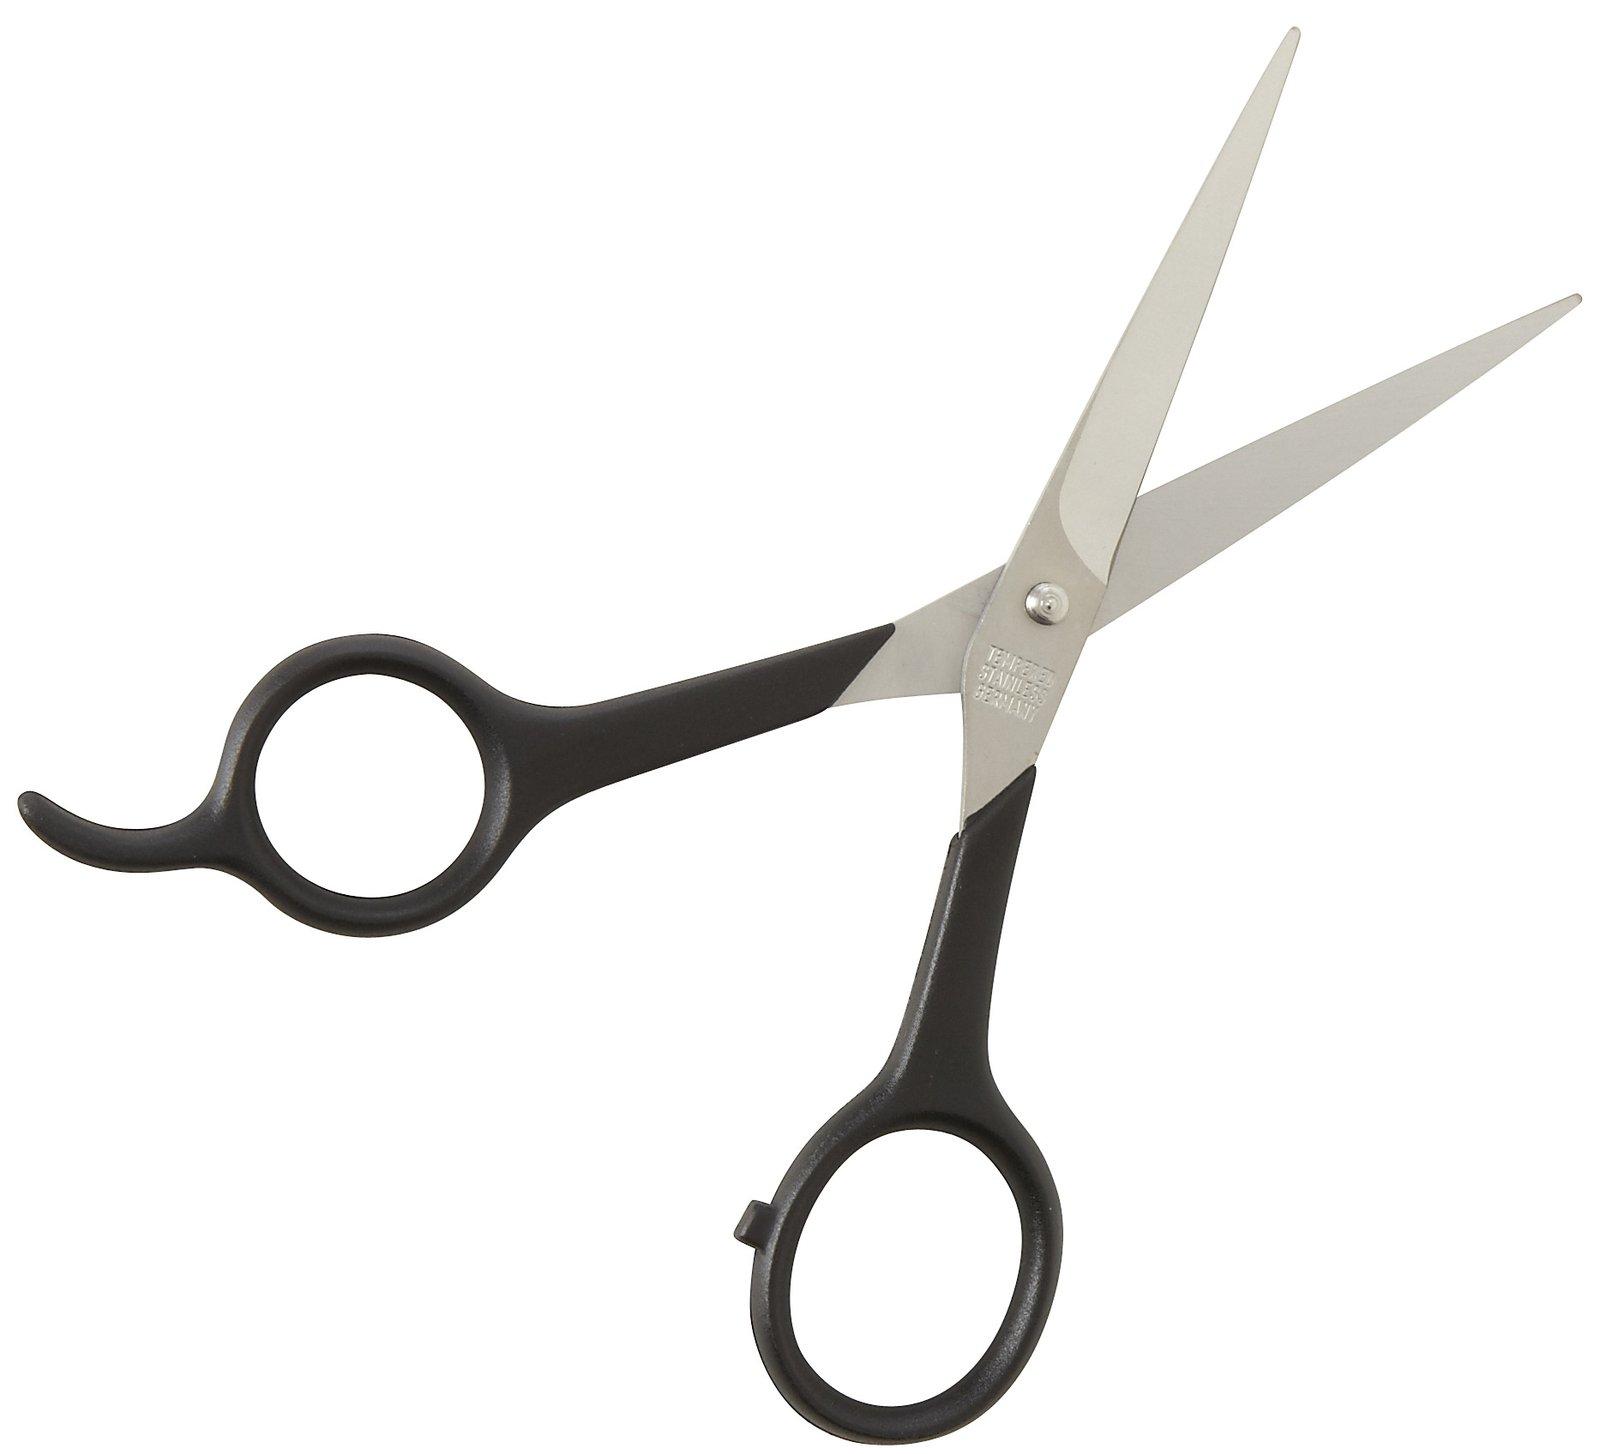 1600x1454 Scissors Clipart, Suggestions For Scissors Clipart, Download